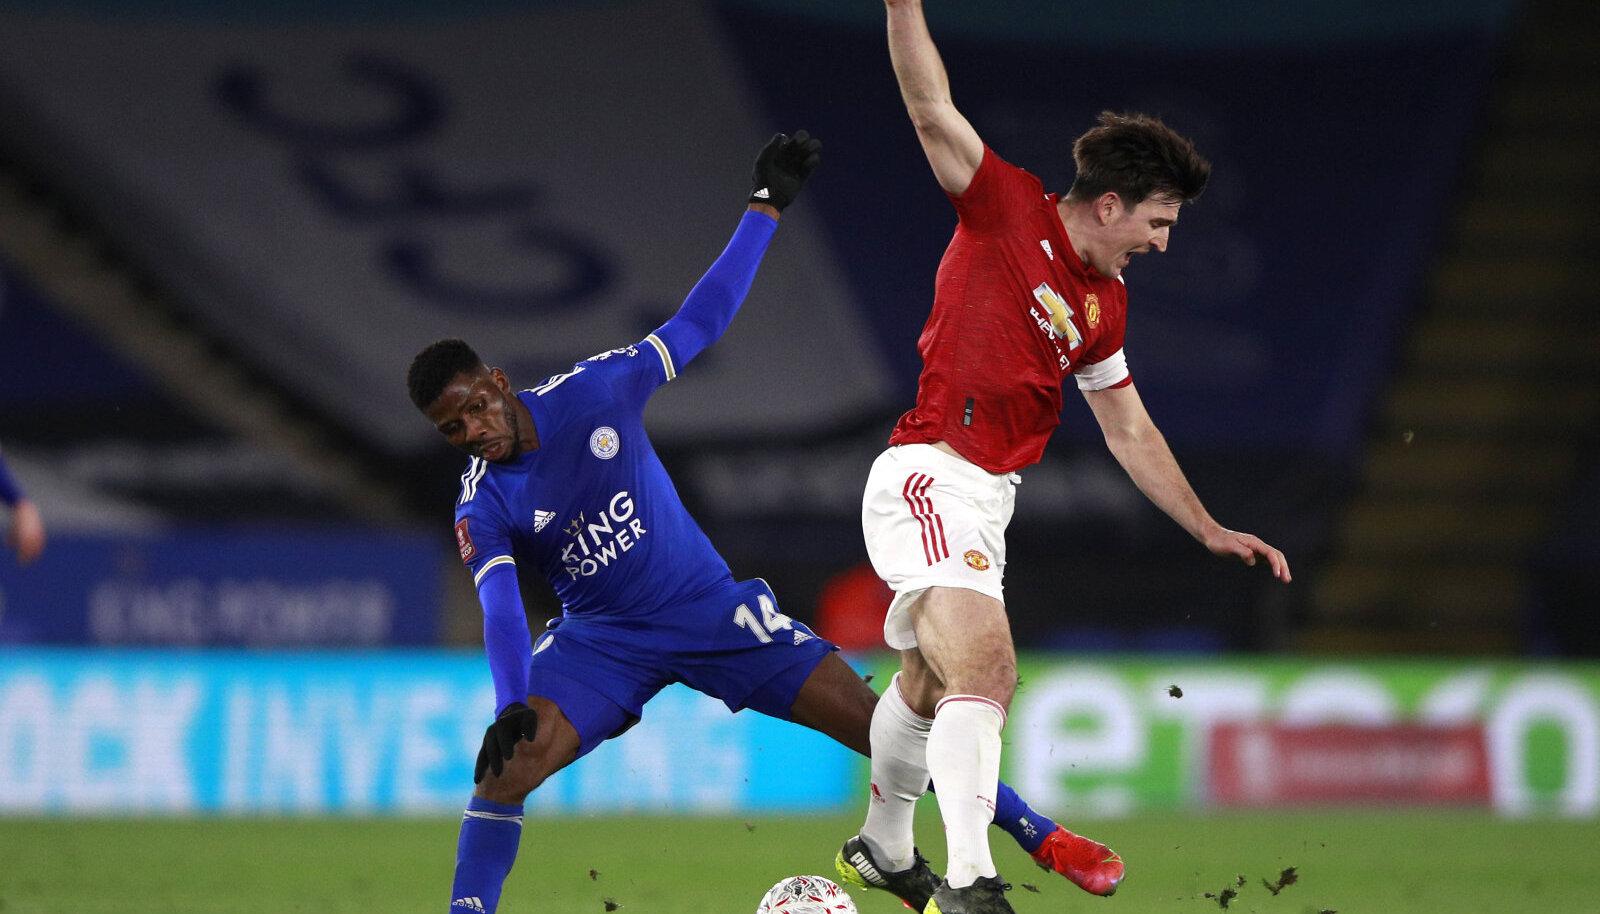 Kaks väravat löönud Kelechi Iheanacho (vasakul) ja Manchester Unitedi kapten Harry Maguire.